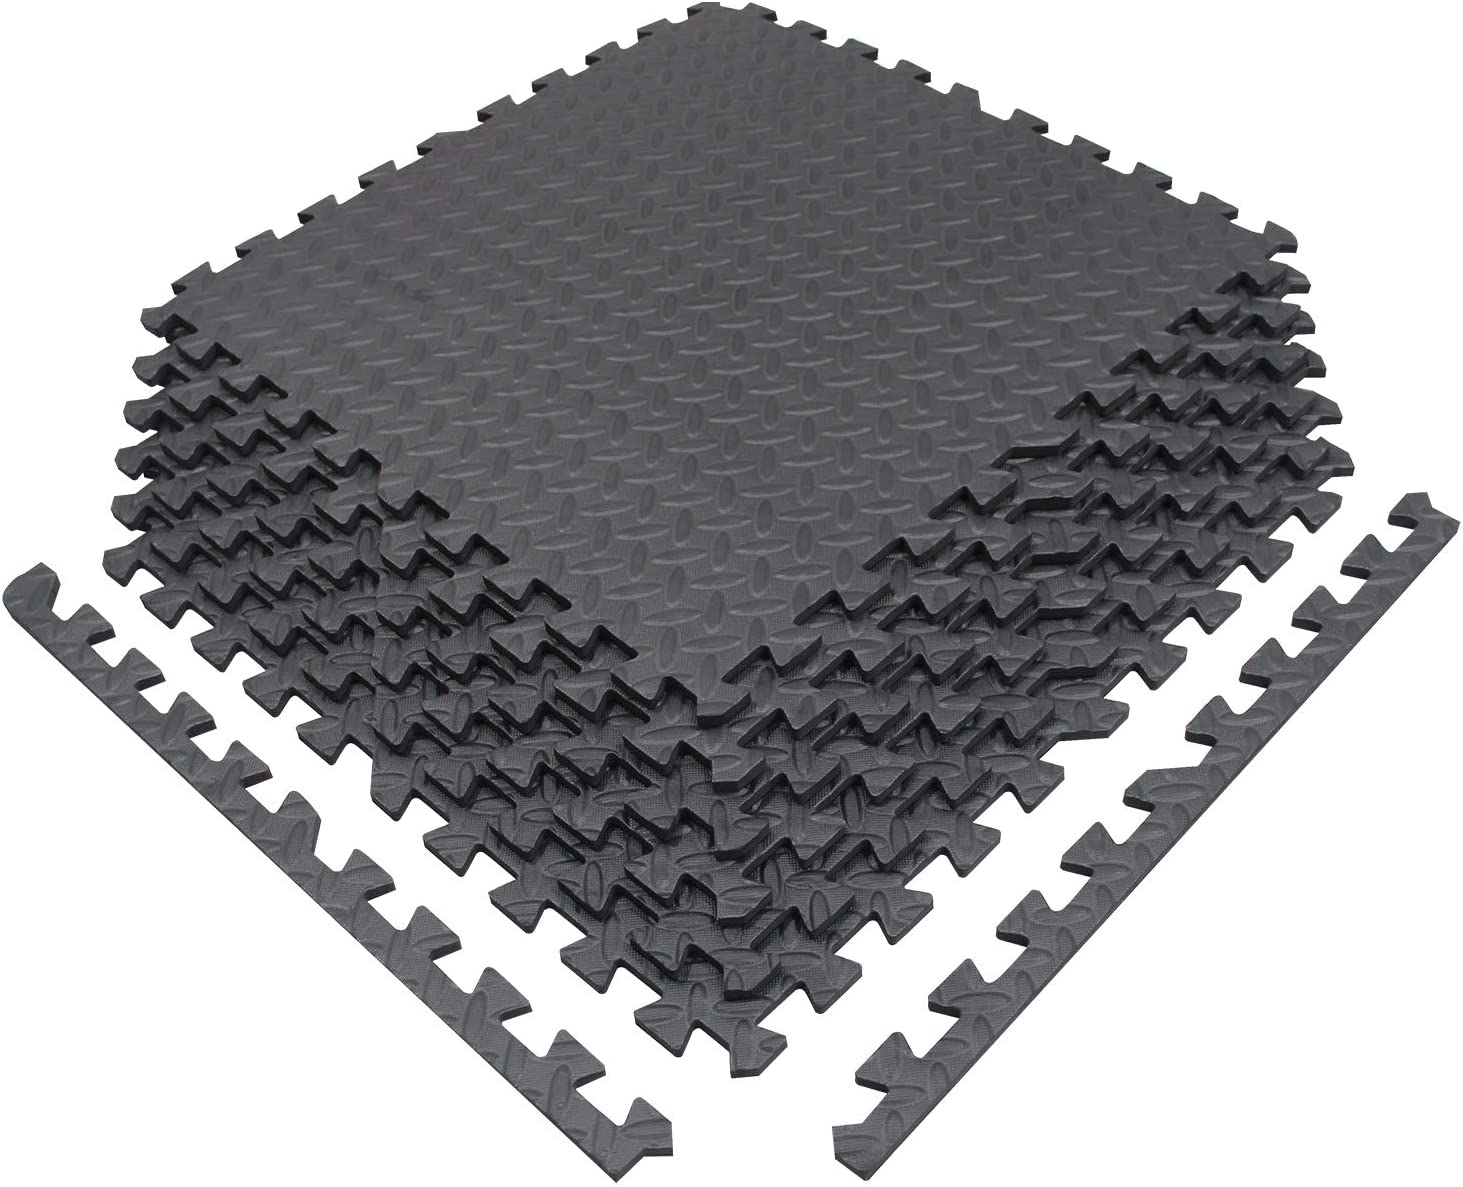 meiqicool Baby Playmats Floor Gyms Jigsaws Puzzles Jigsaw Accessories Puzzle Play Mats Floor Exercise Mats Frame,Fitness Yoga Mats Play Mat Crawling Mat Protective Flooring White and Grey 3512HUI